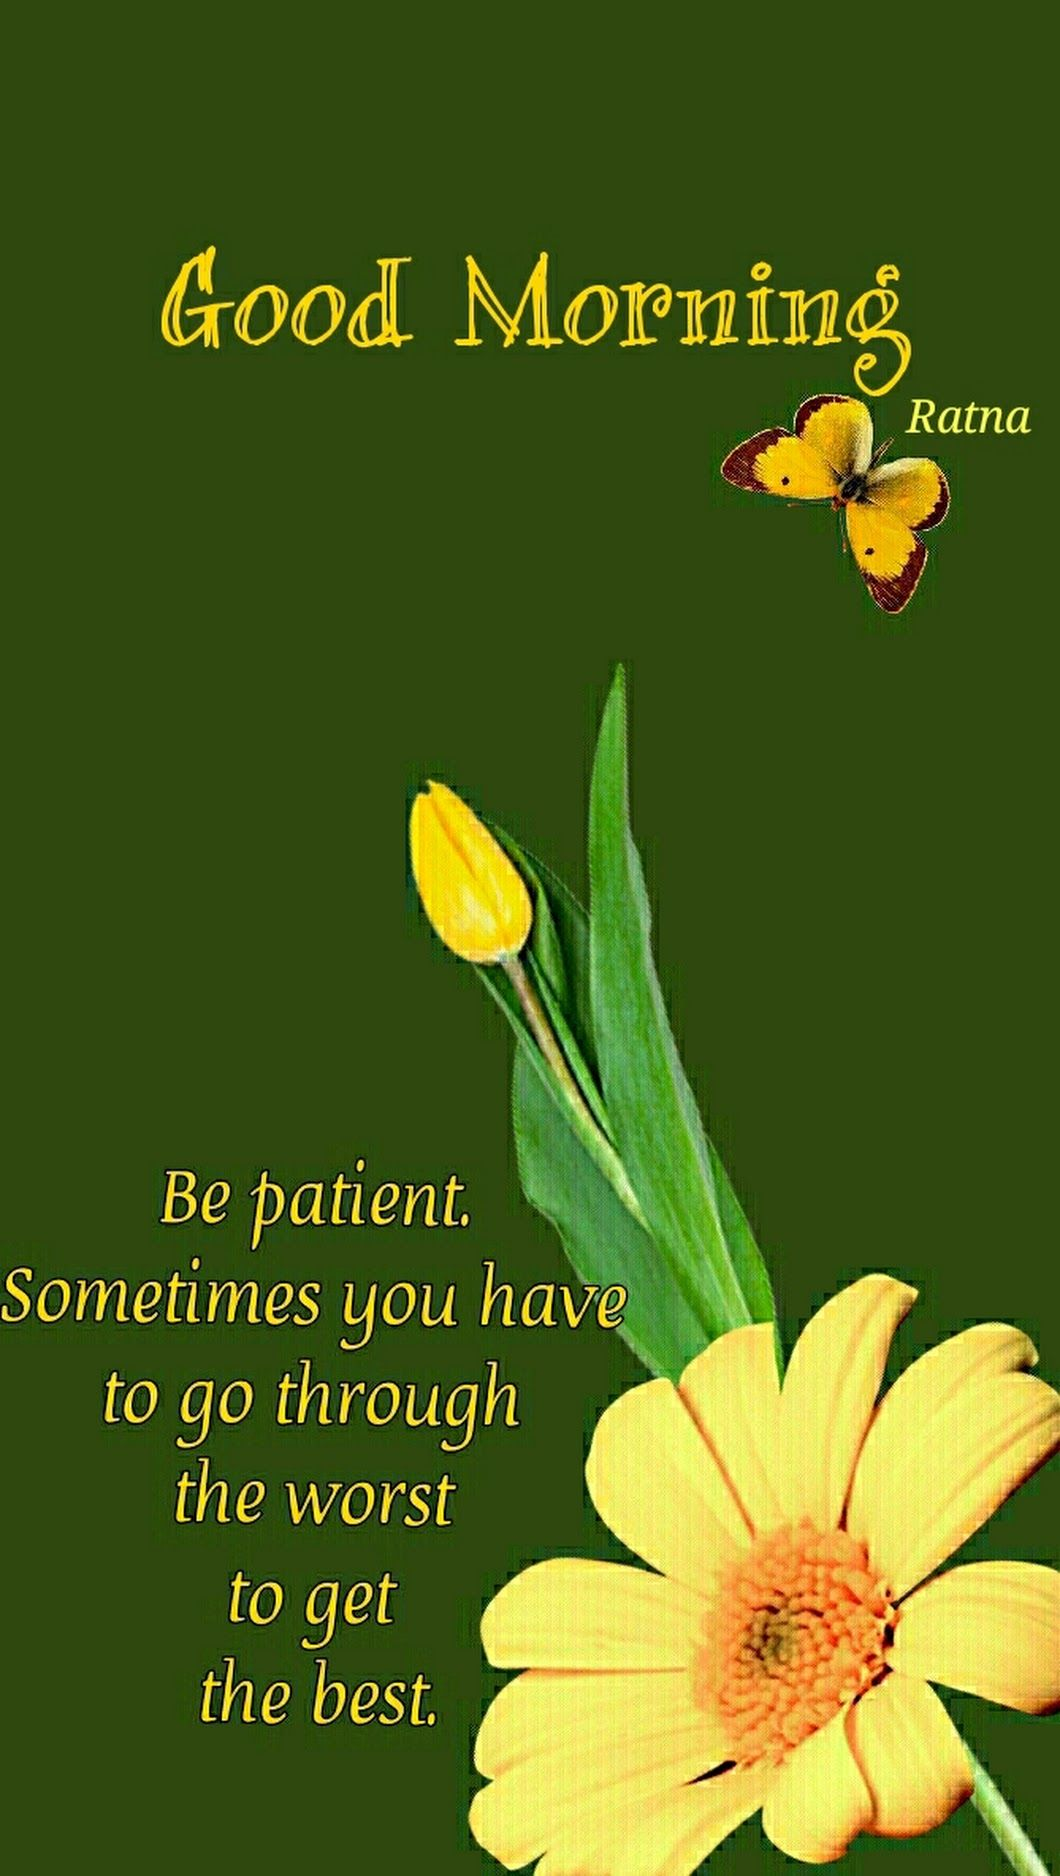 Stay blessed always dear friends 😊 - Ratna Dasgupta ...